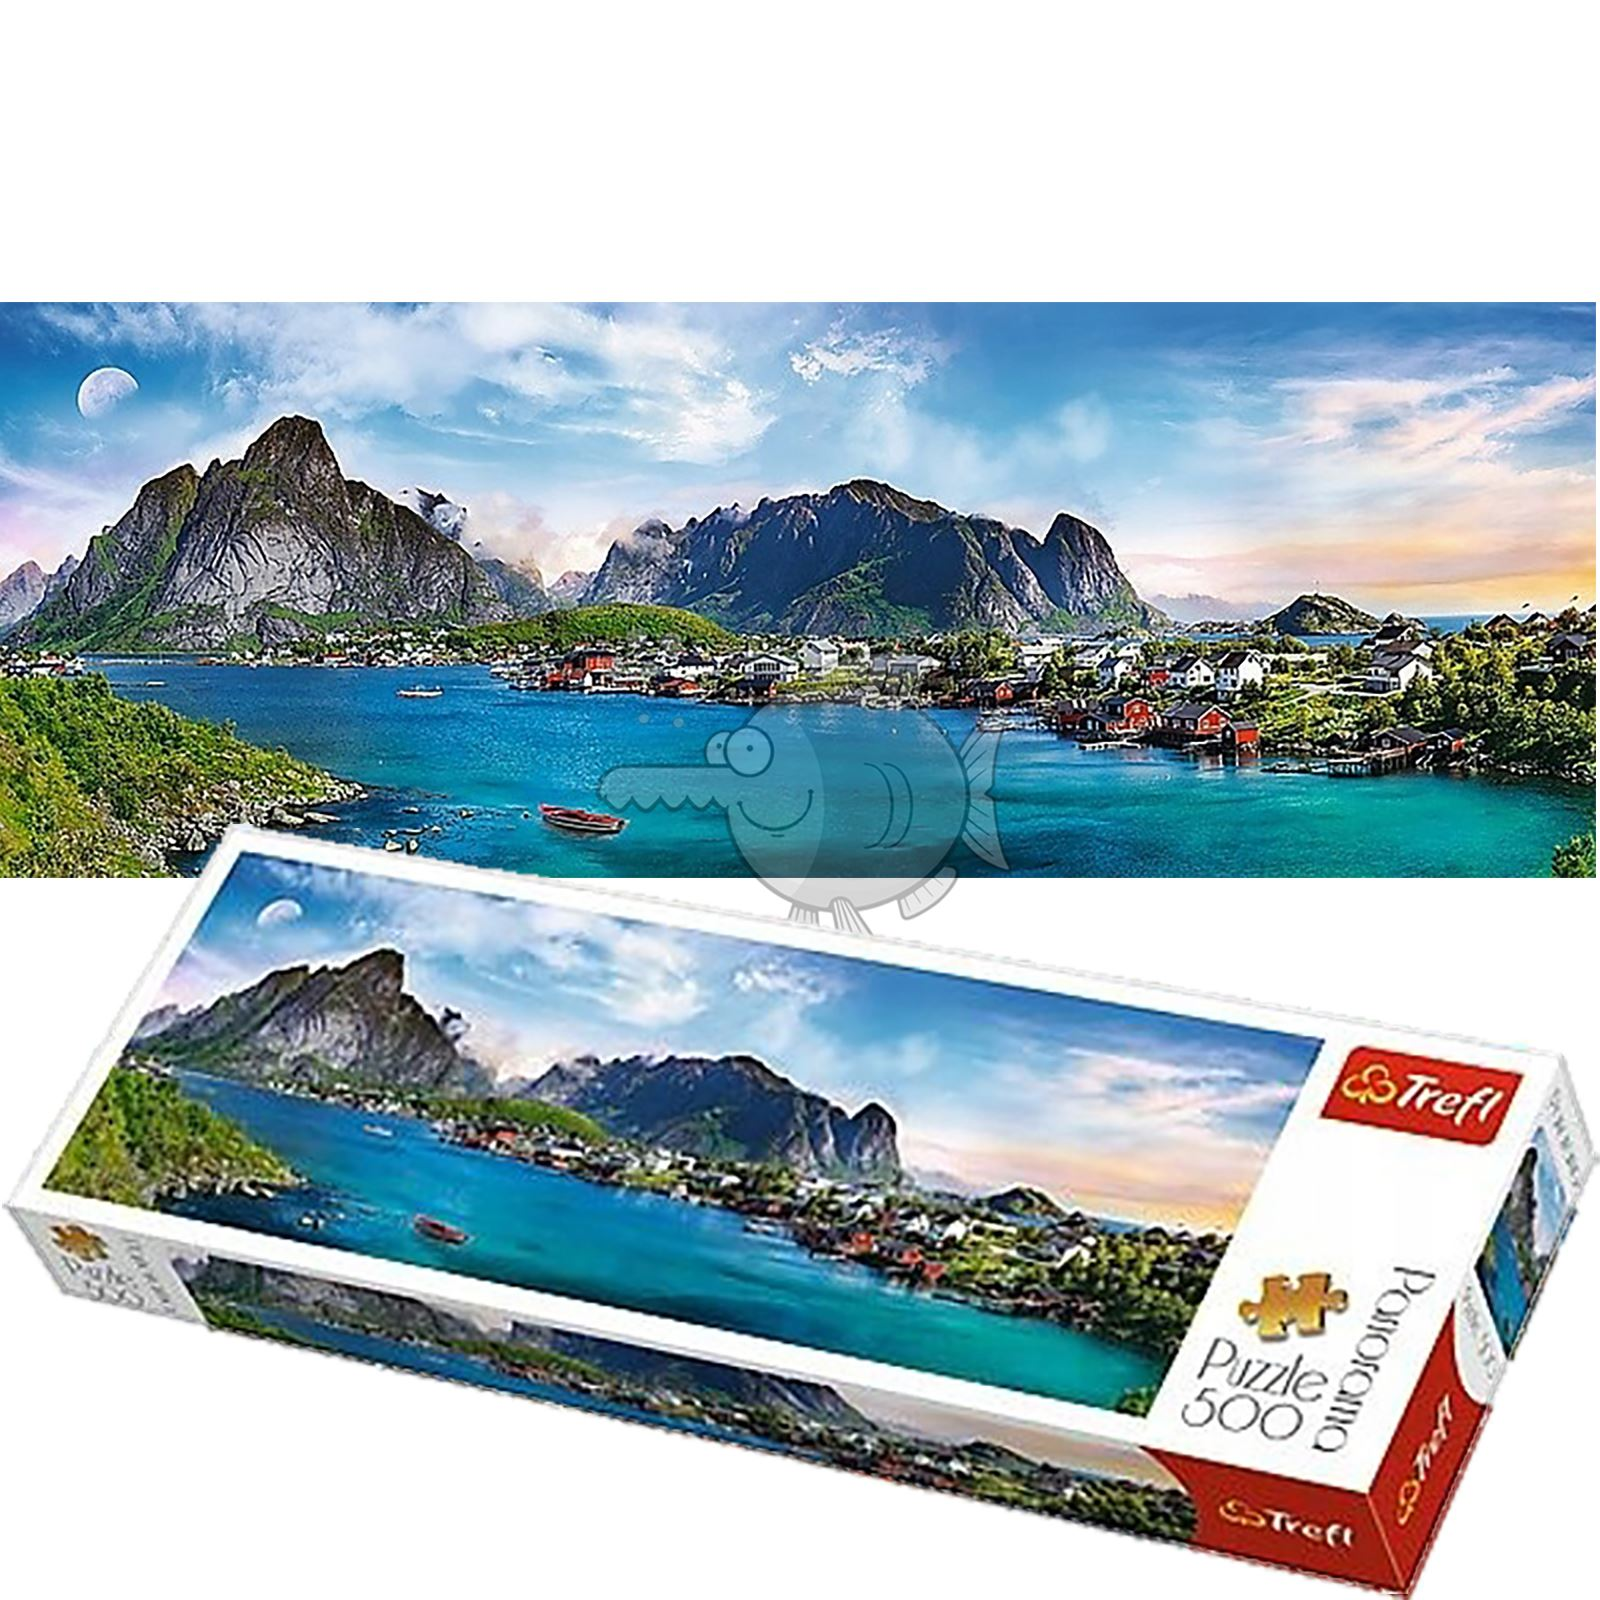 Trefl-300-500-1000-1500-2000-3000-4000-6000-Piece-Jigsaw-Puzzle-Landscapes-City thumbnail 195